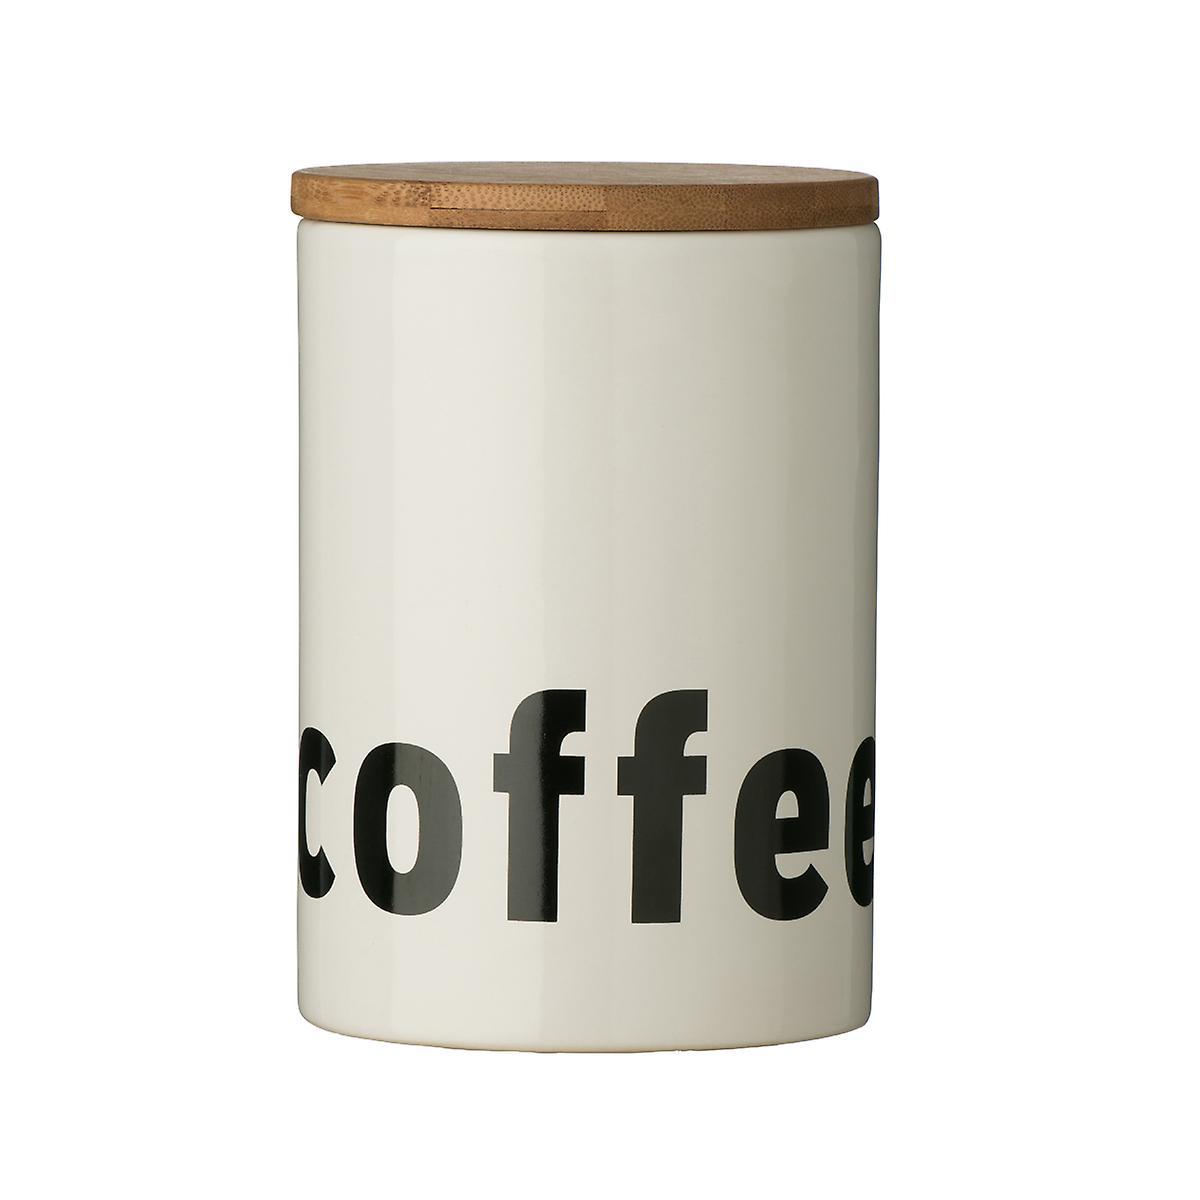 Premier Housewares Mono Coffee Canister, White Black Text